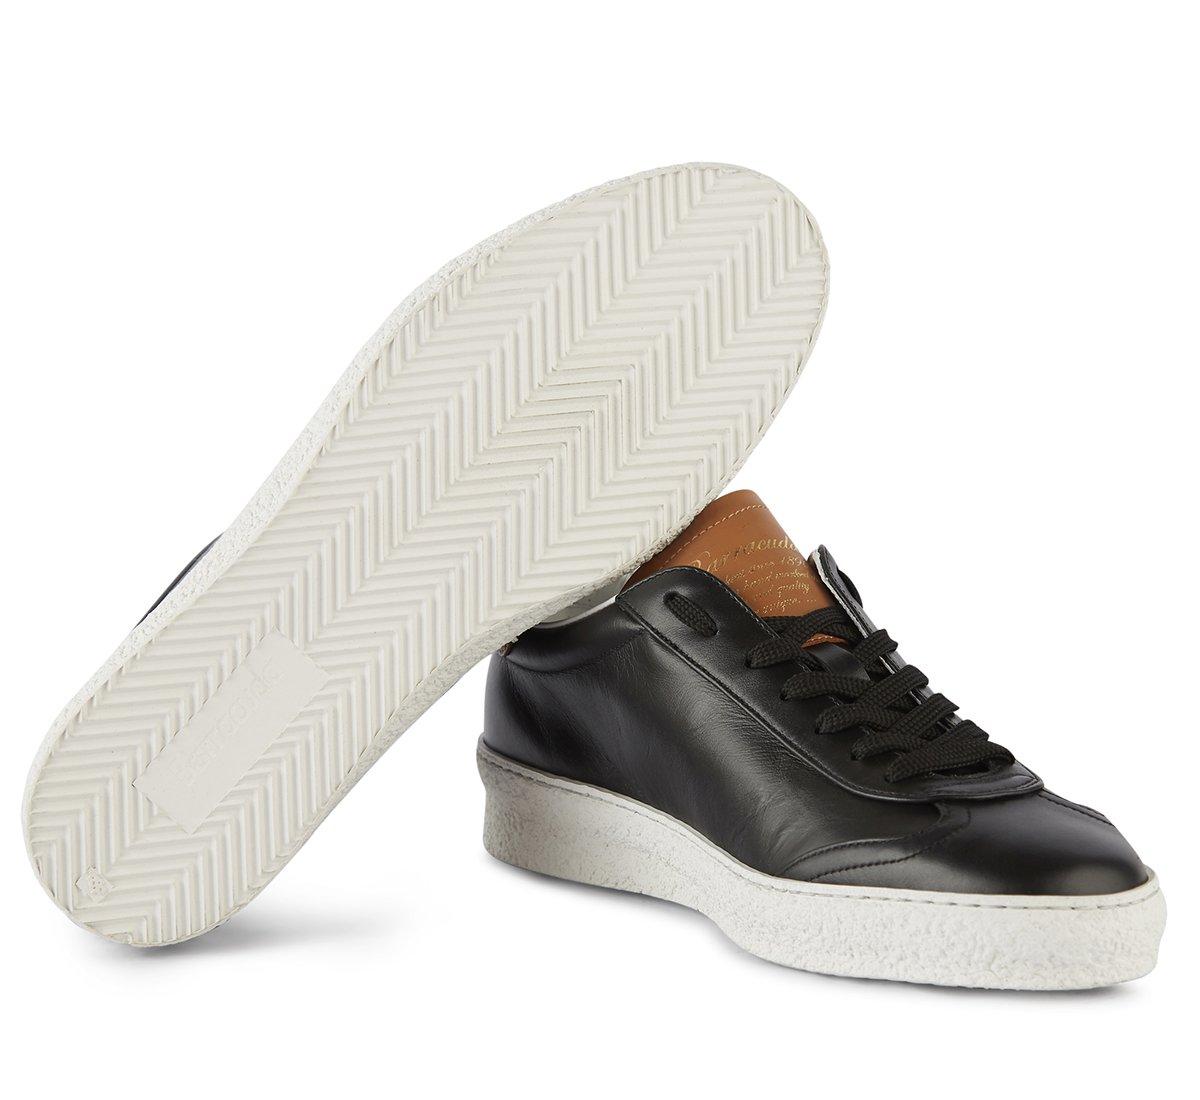 Sneaker Barracuda Guga